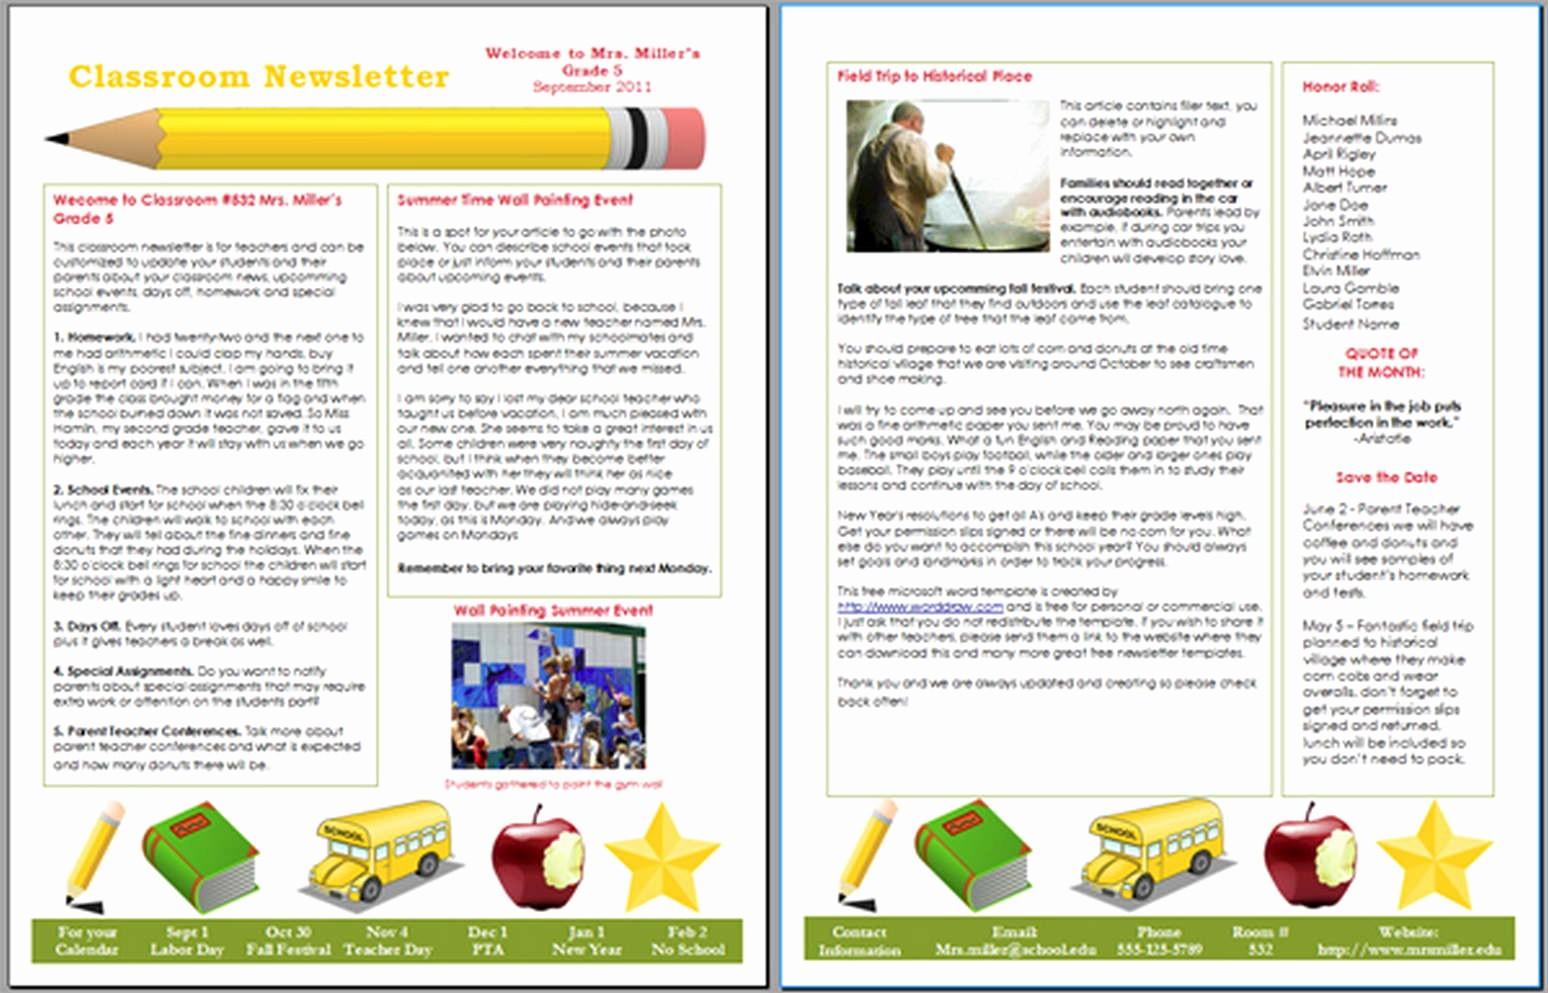 Microsoft Word Newsletter Template Free Beautiful School Newsletter Templates